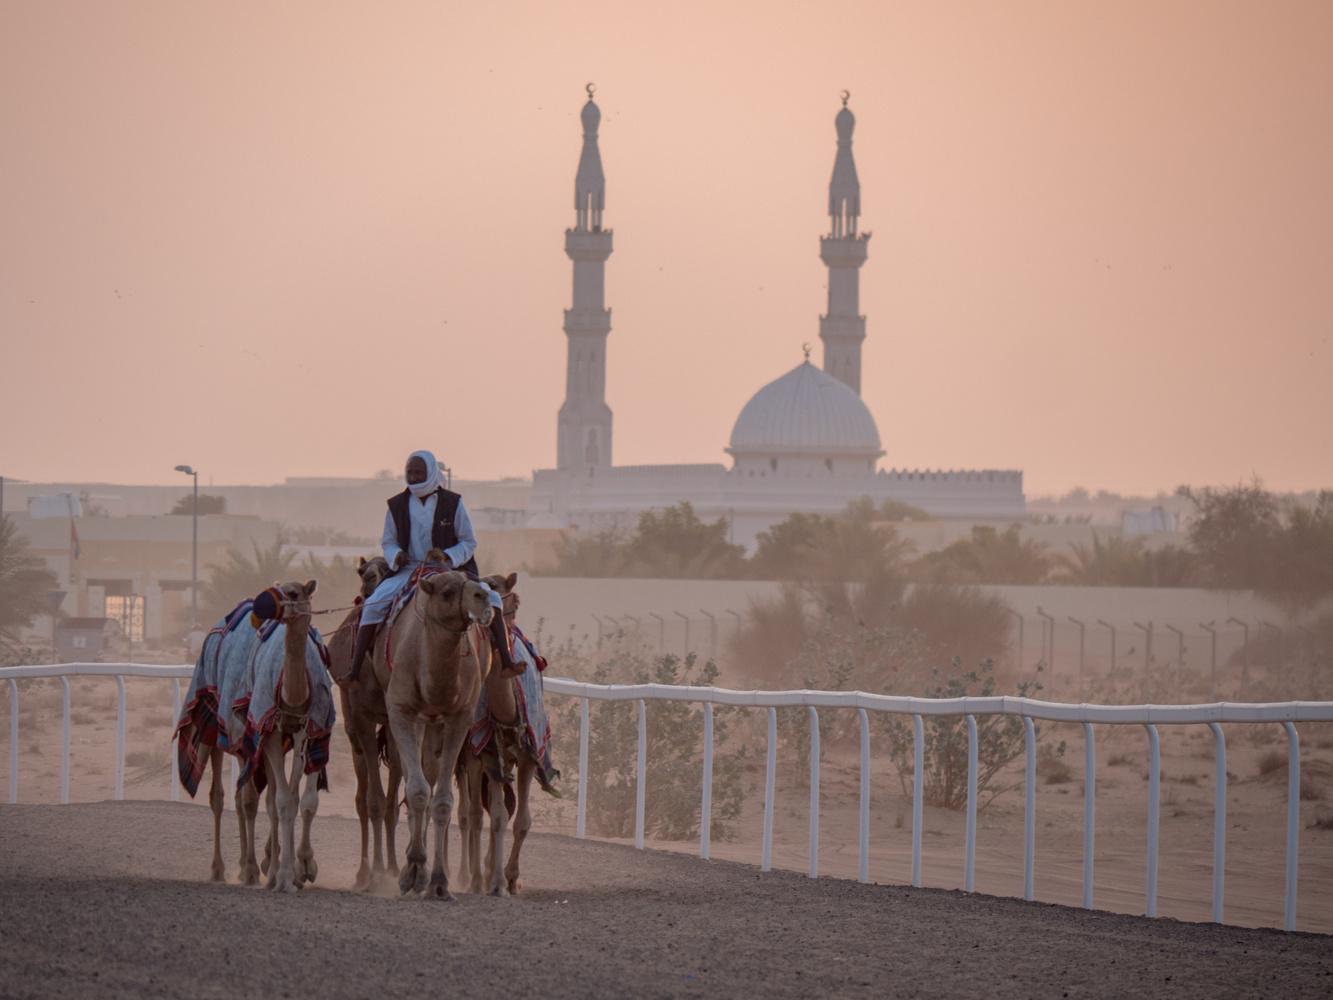 Camel trainers, Dubai by Daniel Simon